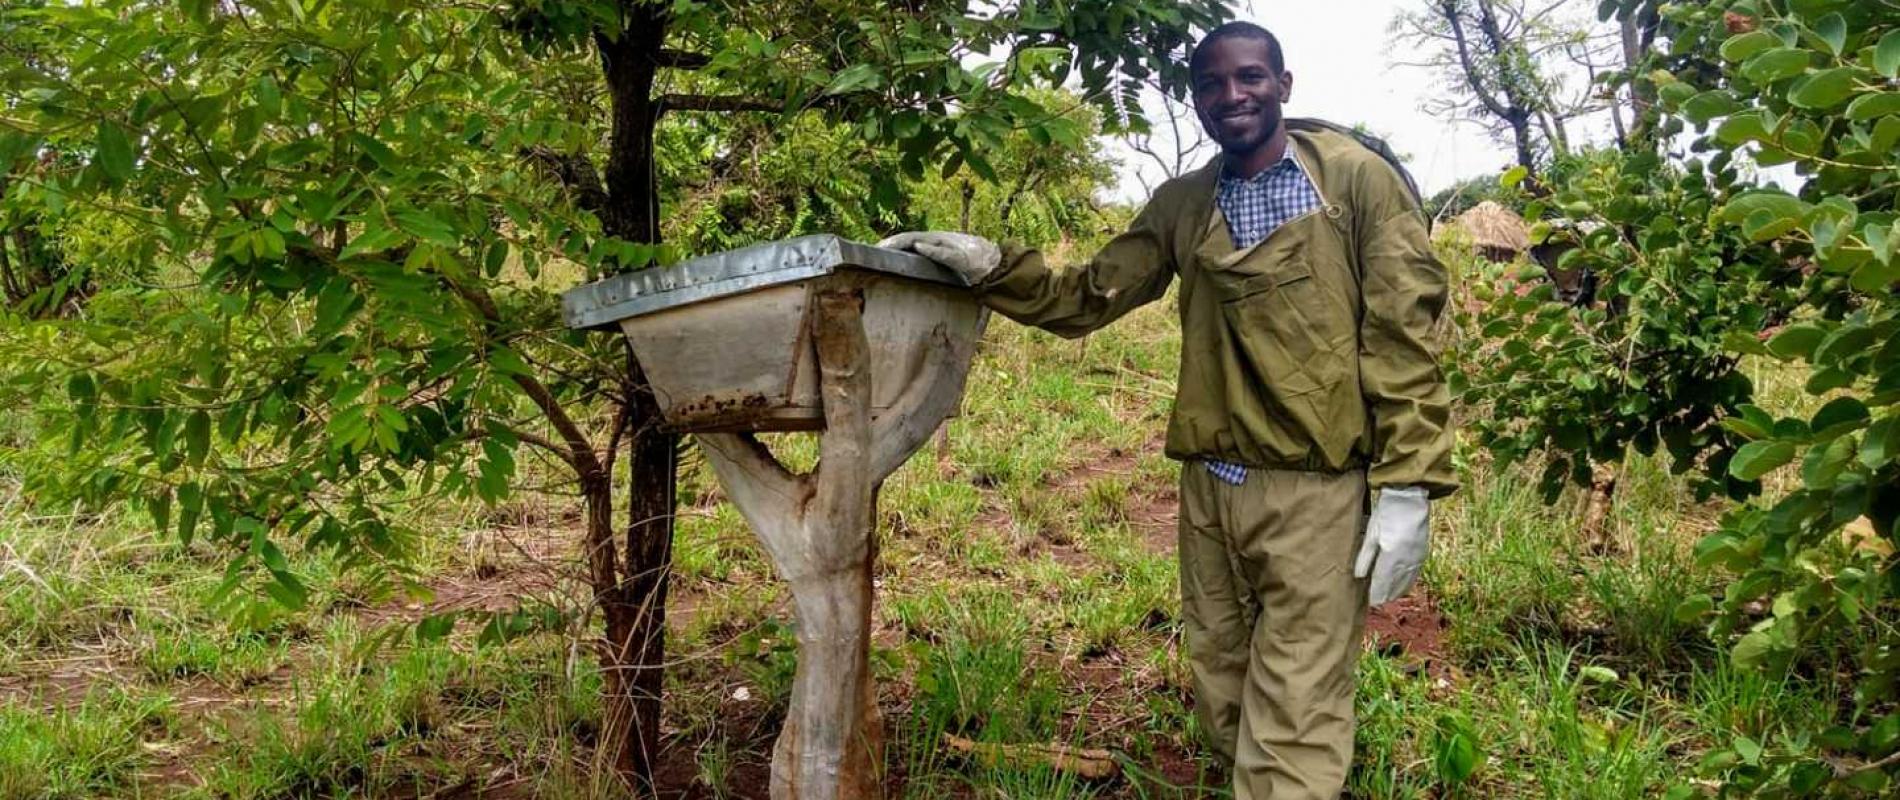 Adp, abim frank (beekeeper trainer)